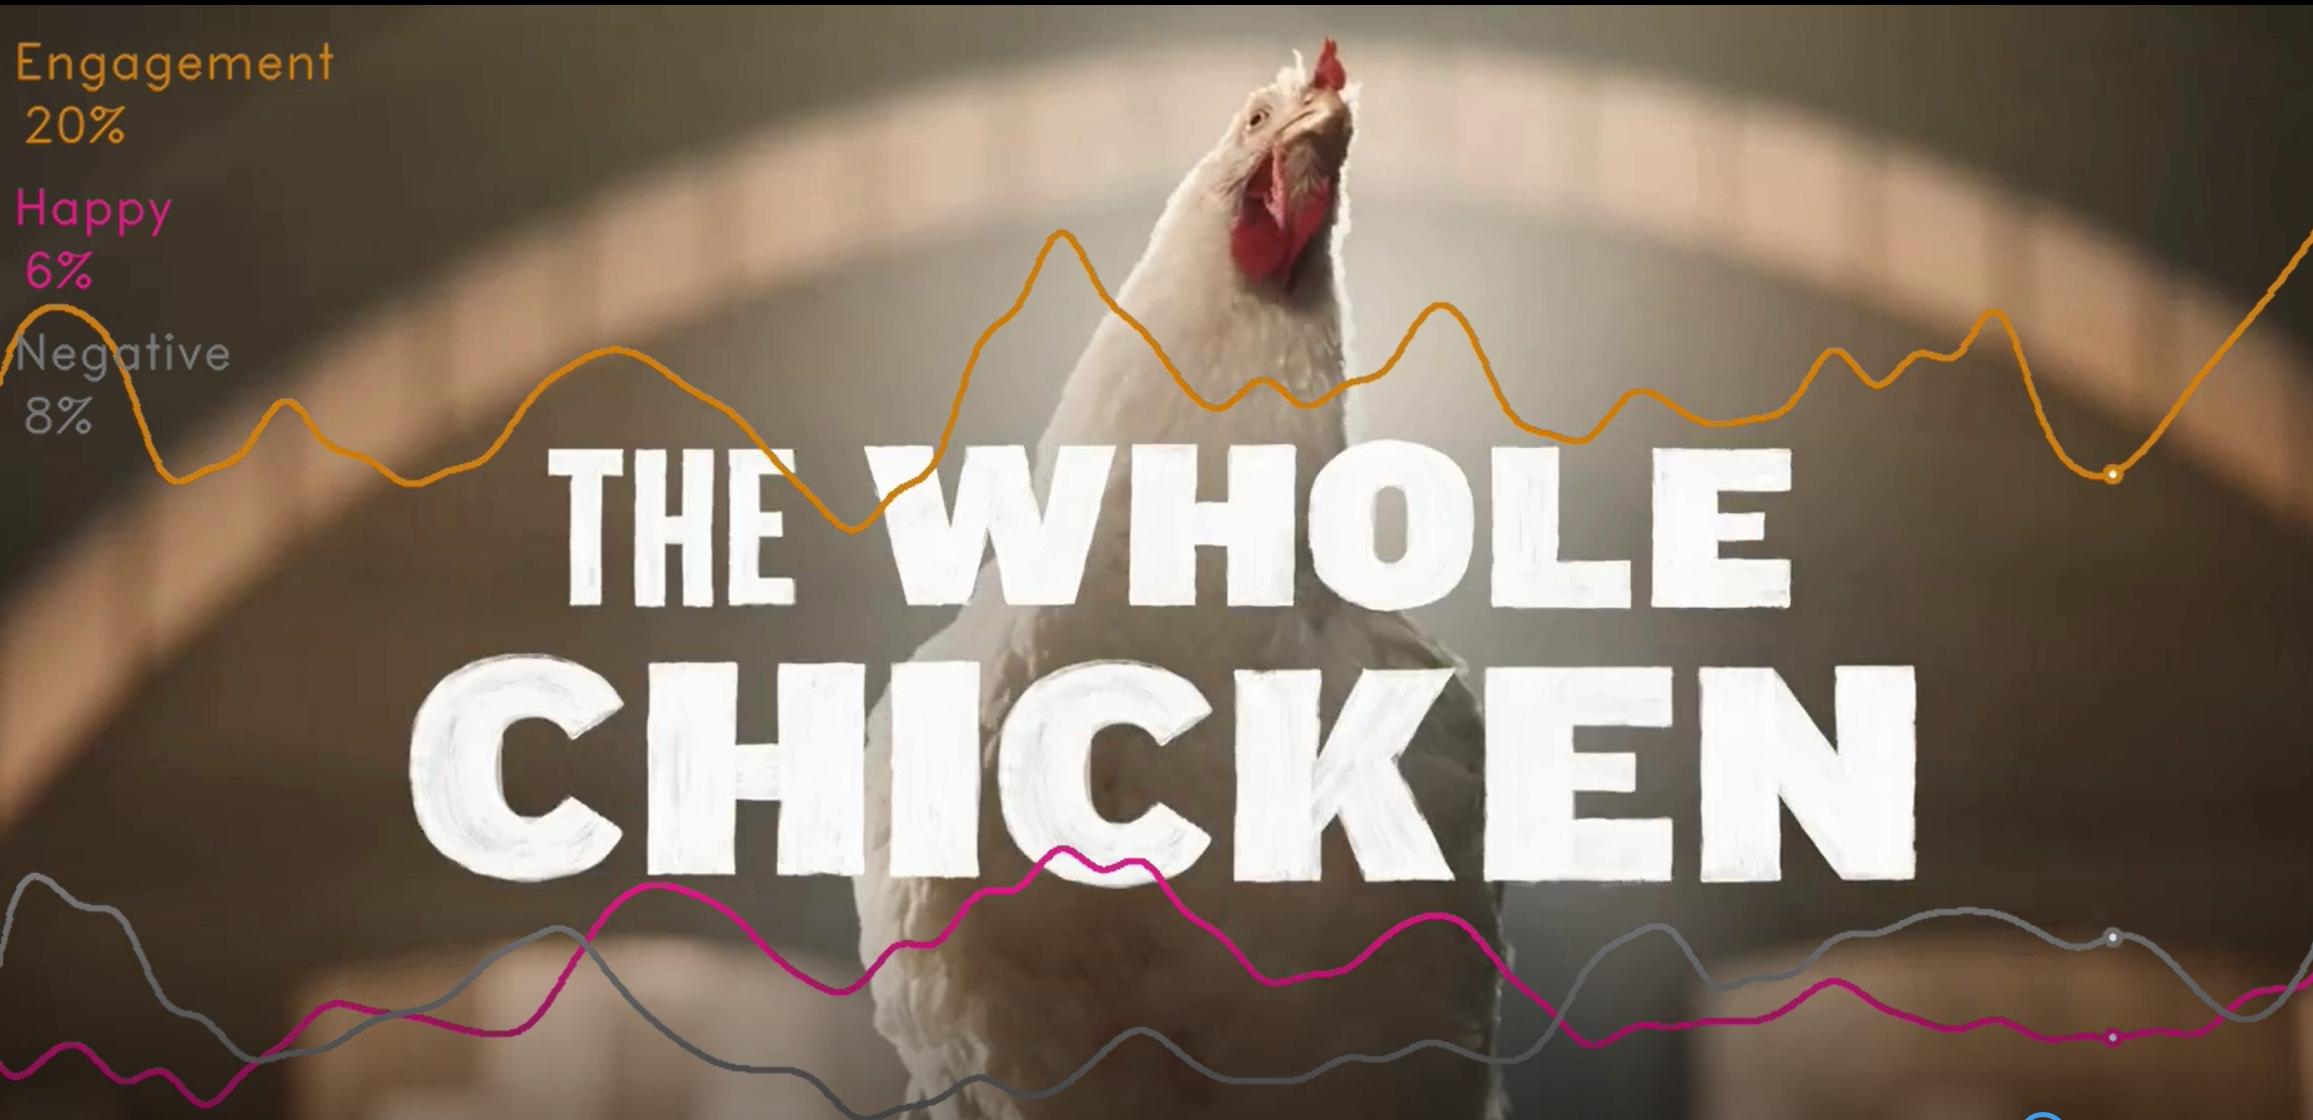 KFC's whole chicken: bon appetit?